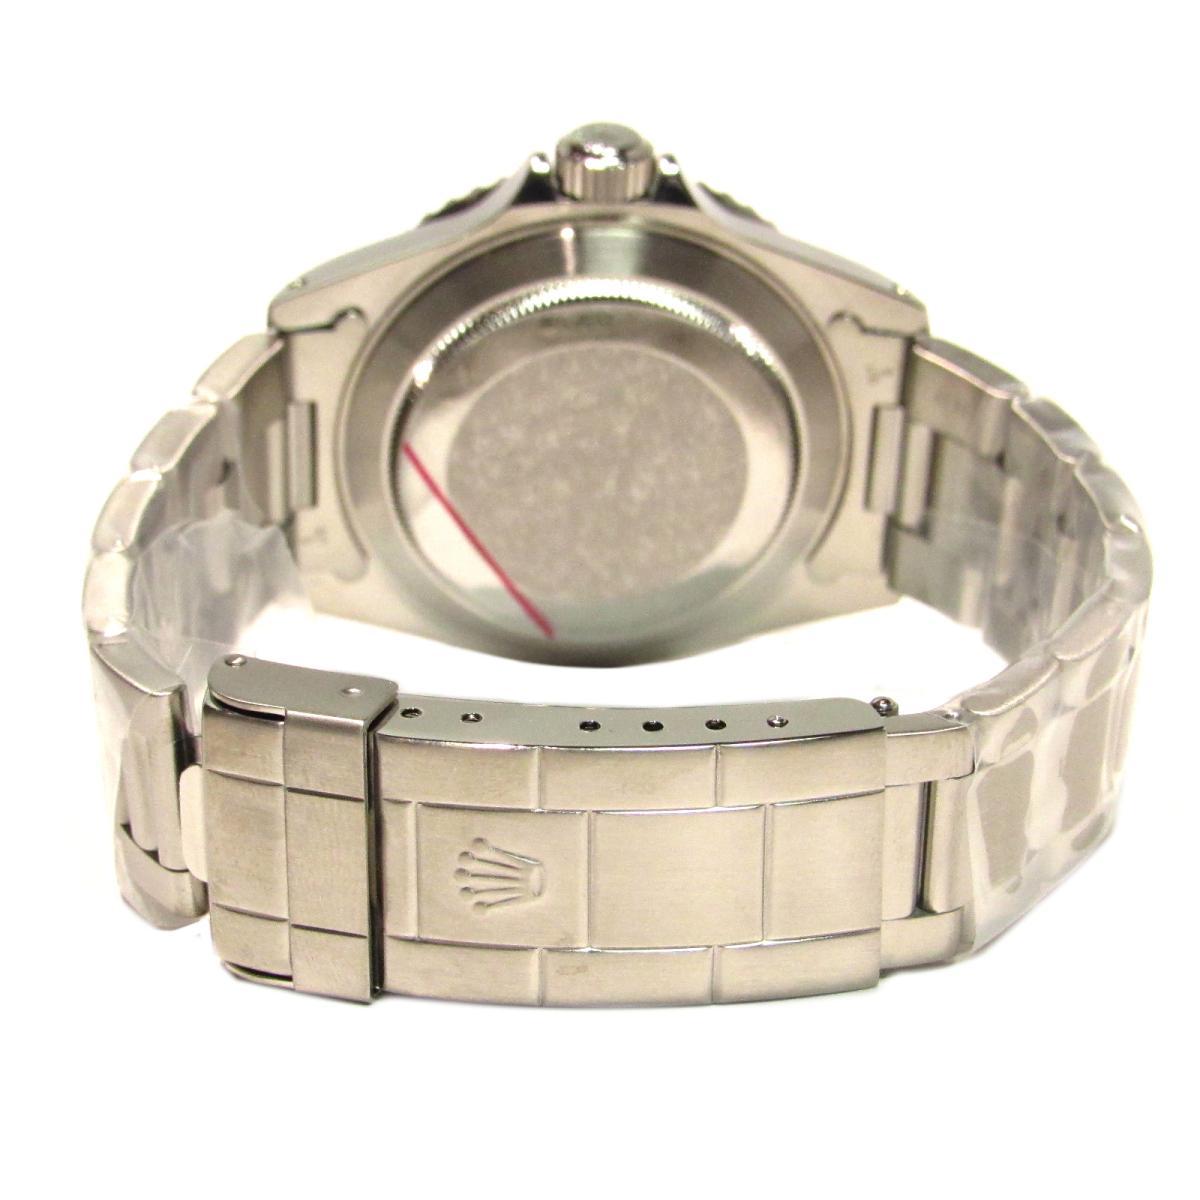 huge discount abbe5 f268d 中古】 ロレックス サブマリーナ・ノンデイト 腕時計 ウォッチ ...